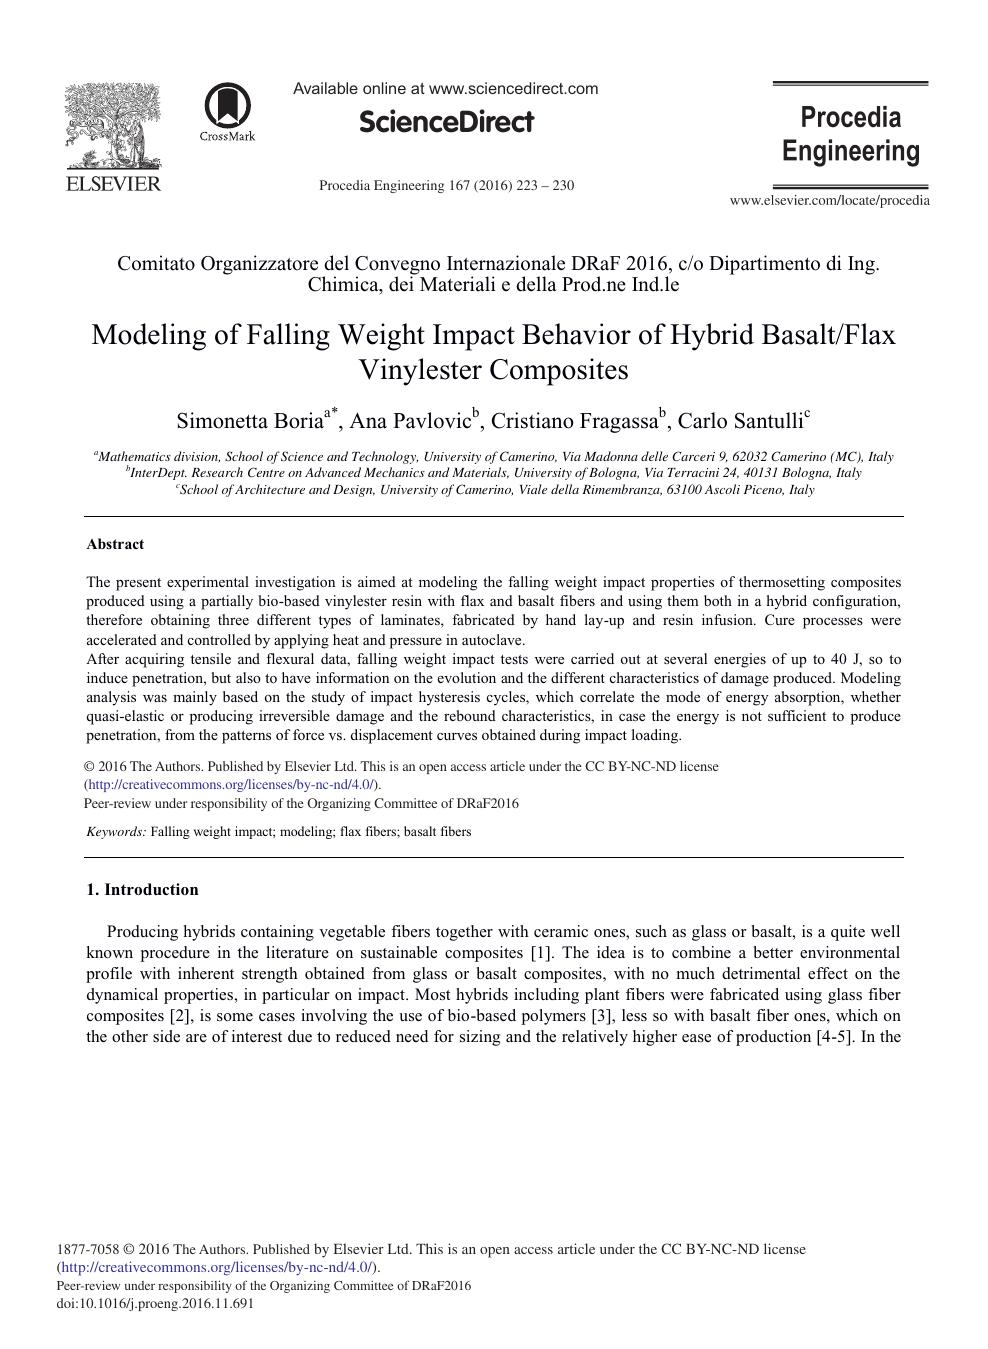 Modeling of Falling Weight Impact Behavior of Hybrid Basalt